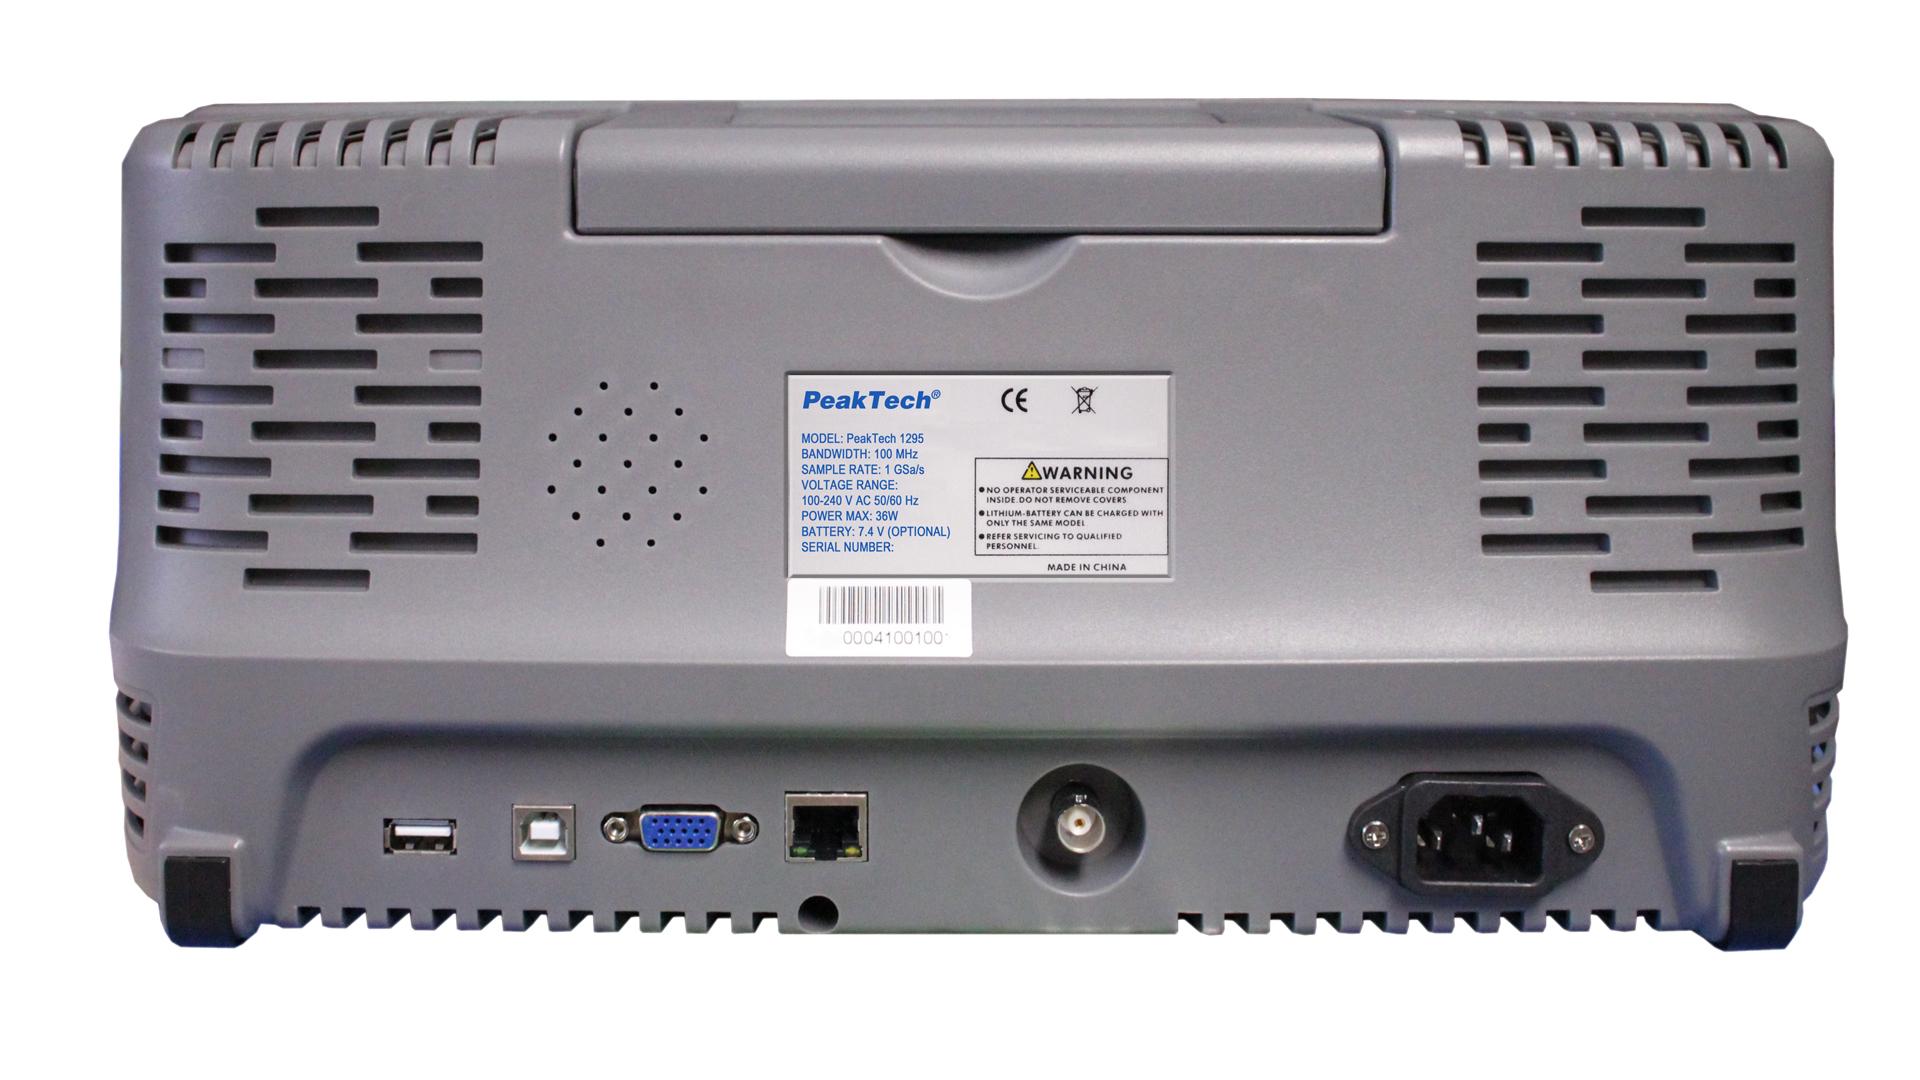 «PeakTech® P 1300» 200 MHz / 4 CH, 2 GS/s touchscreen oscilloscope